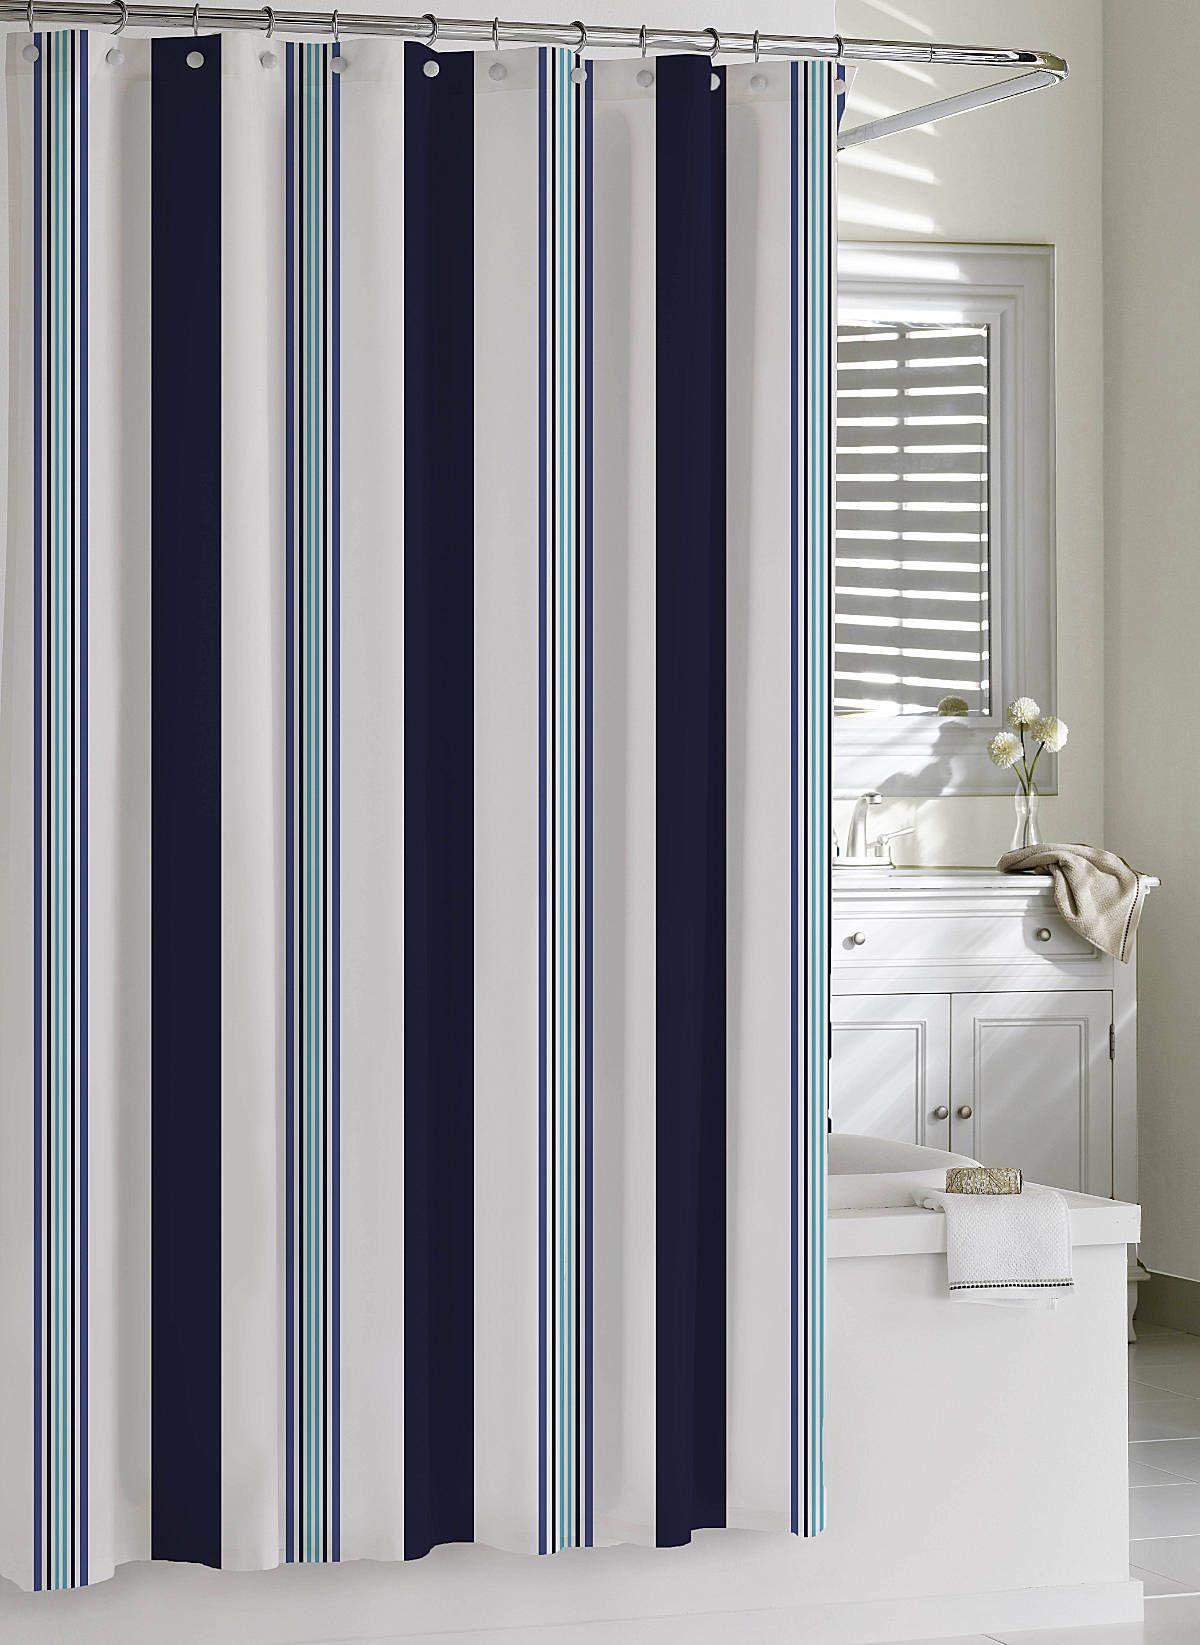 Luxury Shower Curtains | Cabana Stripe Shower Curtain by Kassatex ...